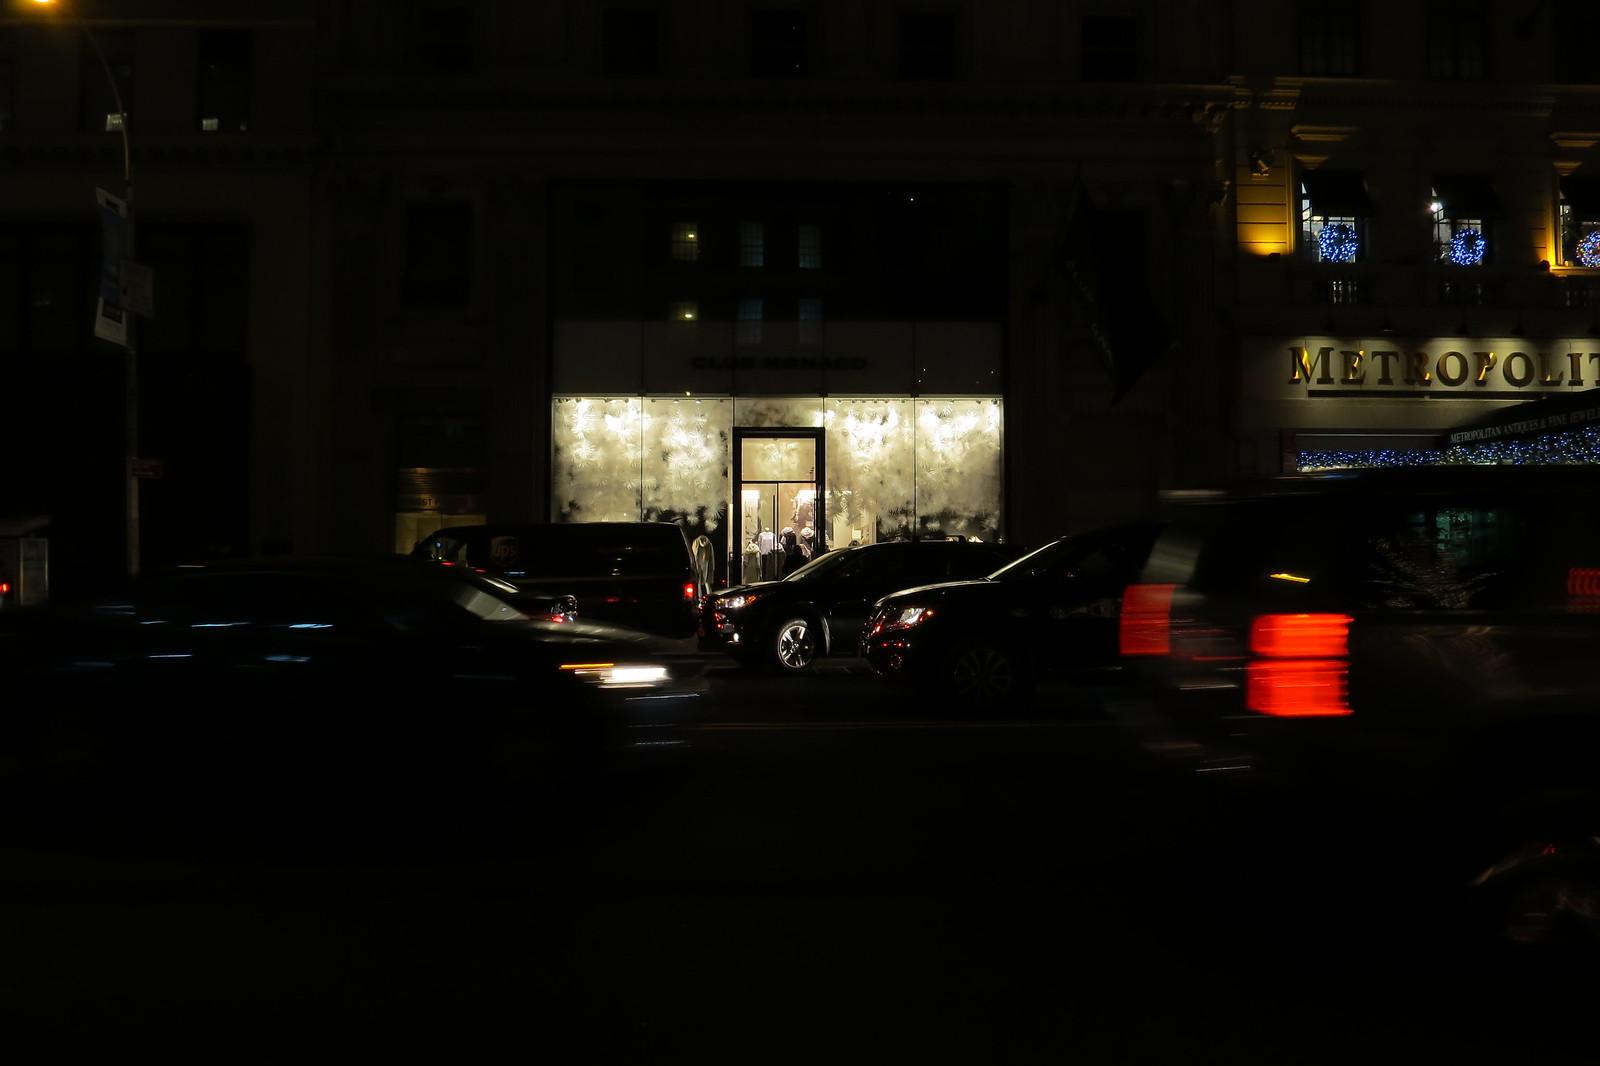 Club Monaco, 6 West 57th Street, NY